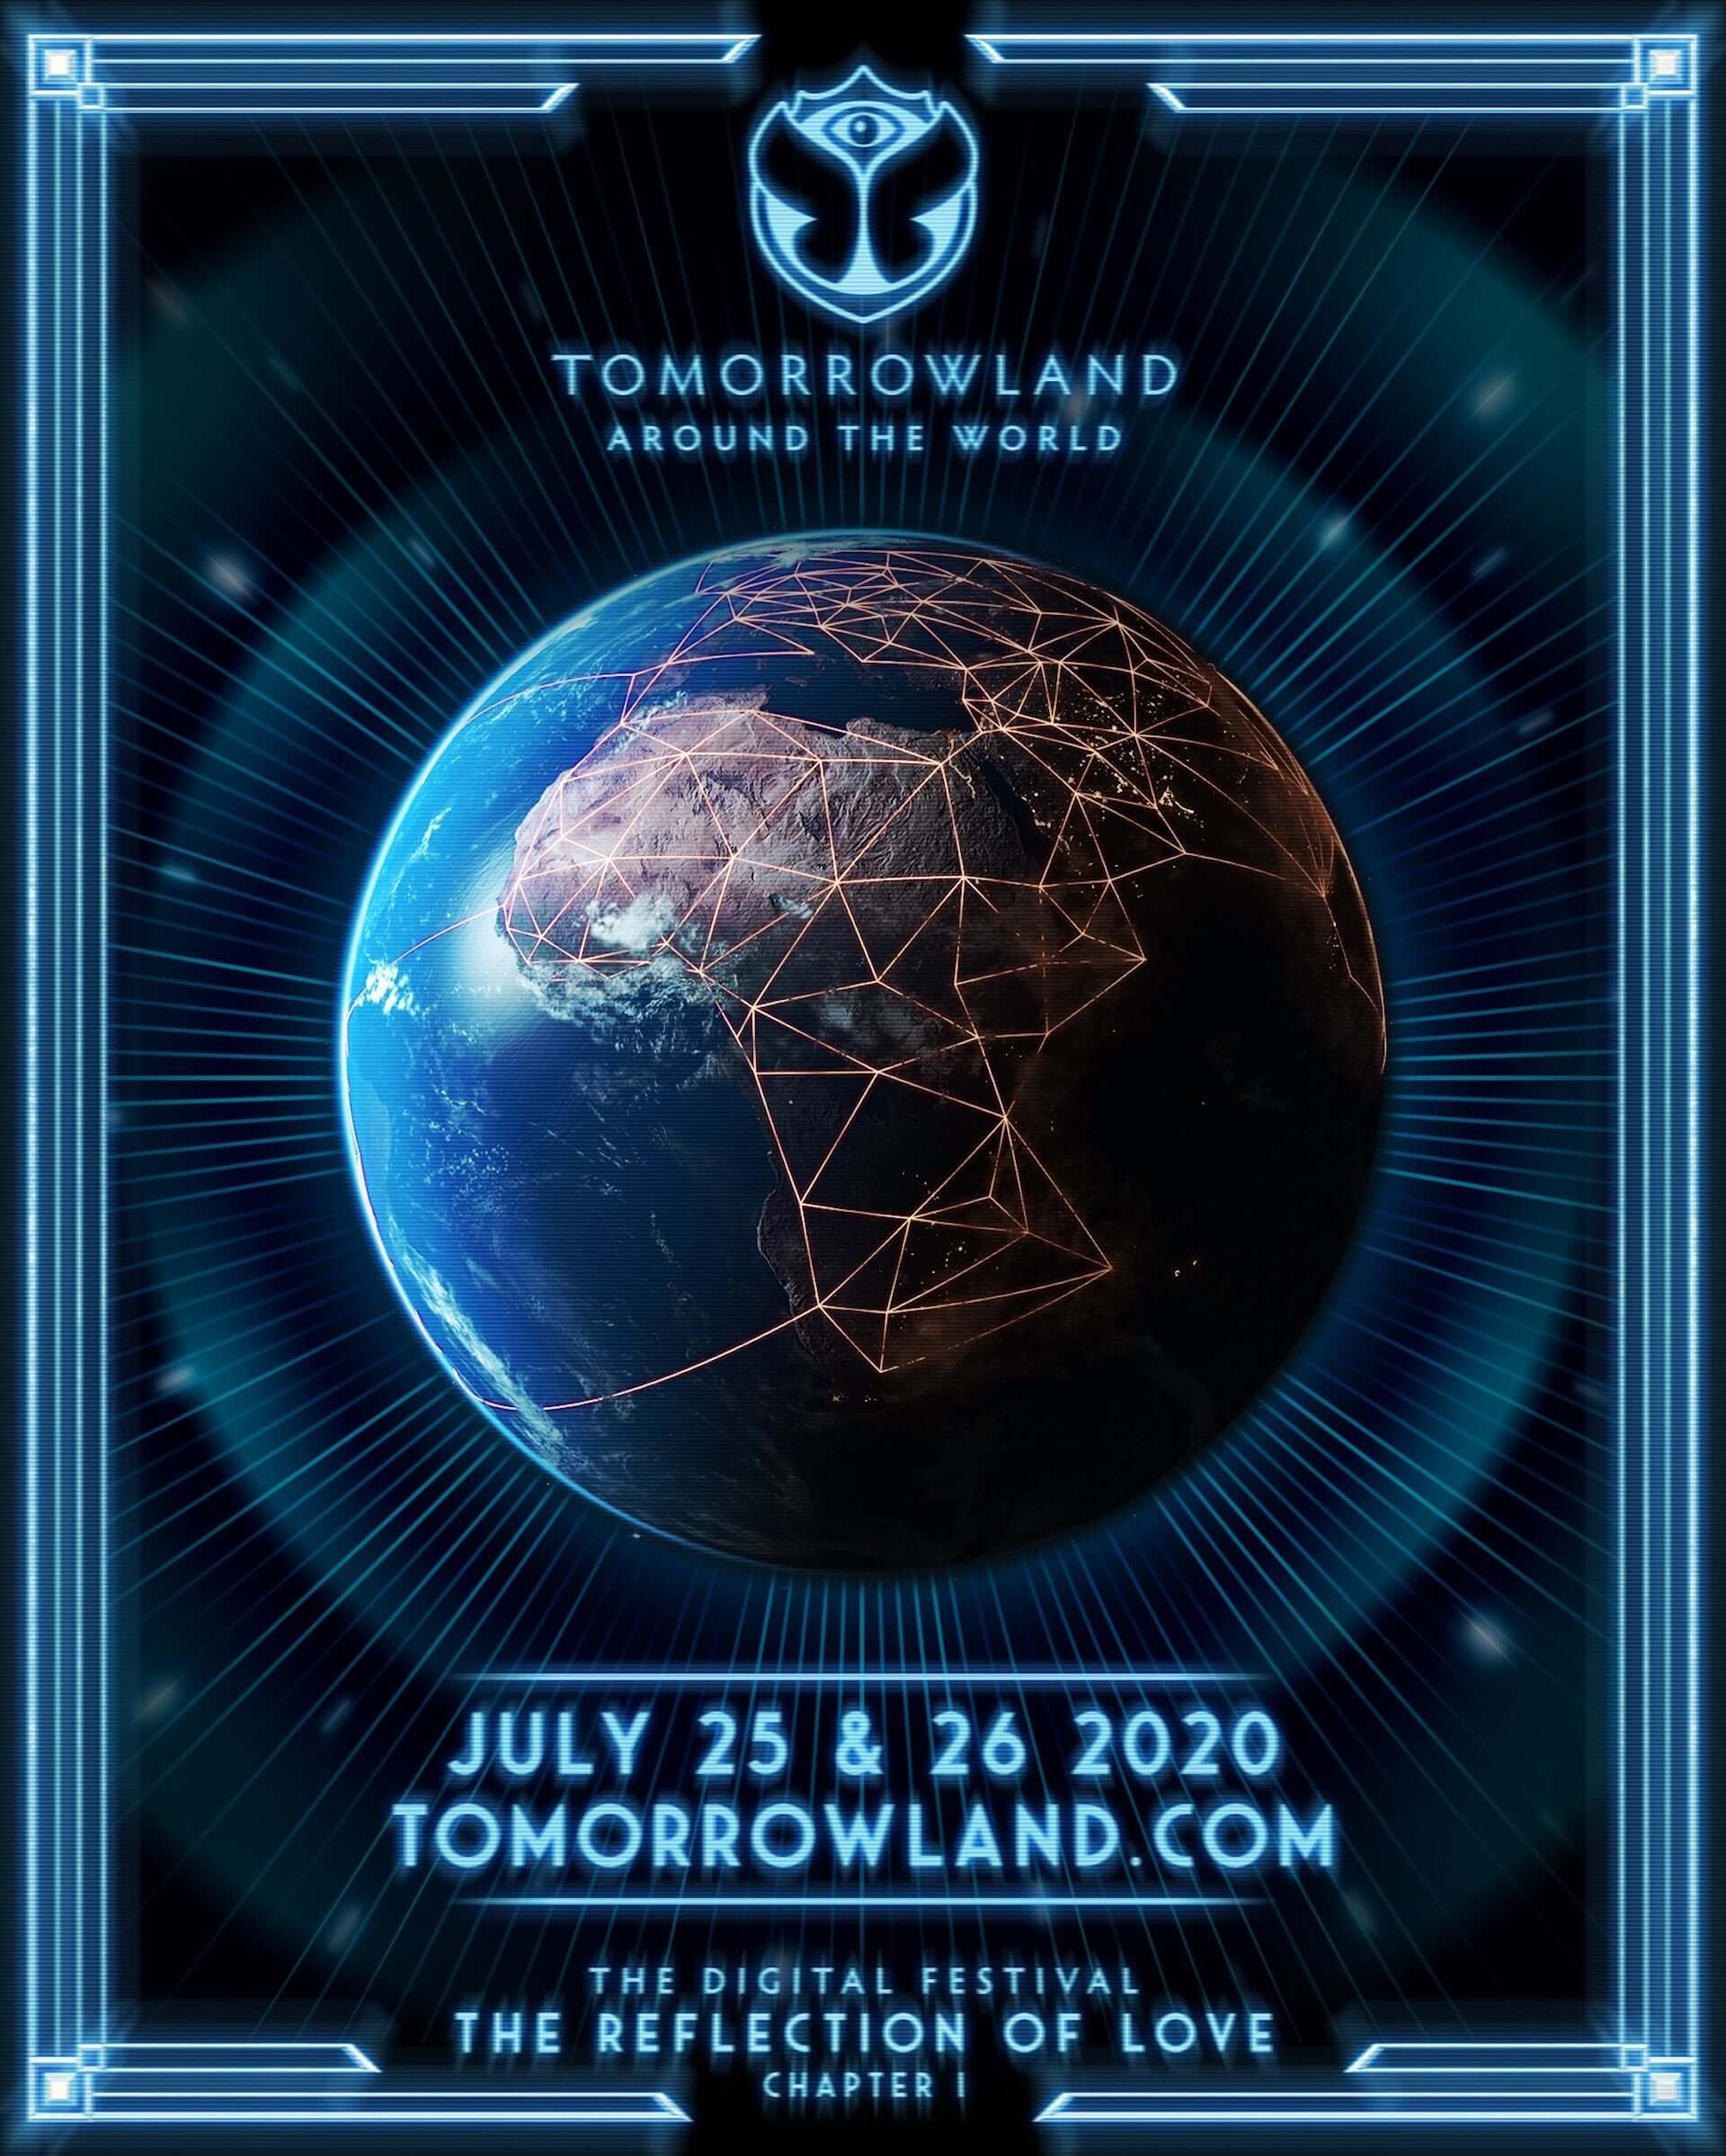 <TOMORROWLAND>が、史上初のデジタルフェスを開催決定!3Dバーチャルマップや初公開コンテンツが配信 music200605_tomorrowland_02-1920x2398